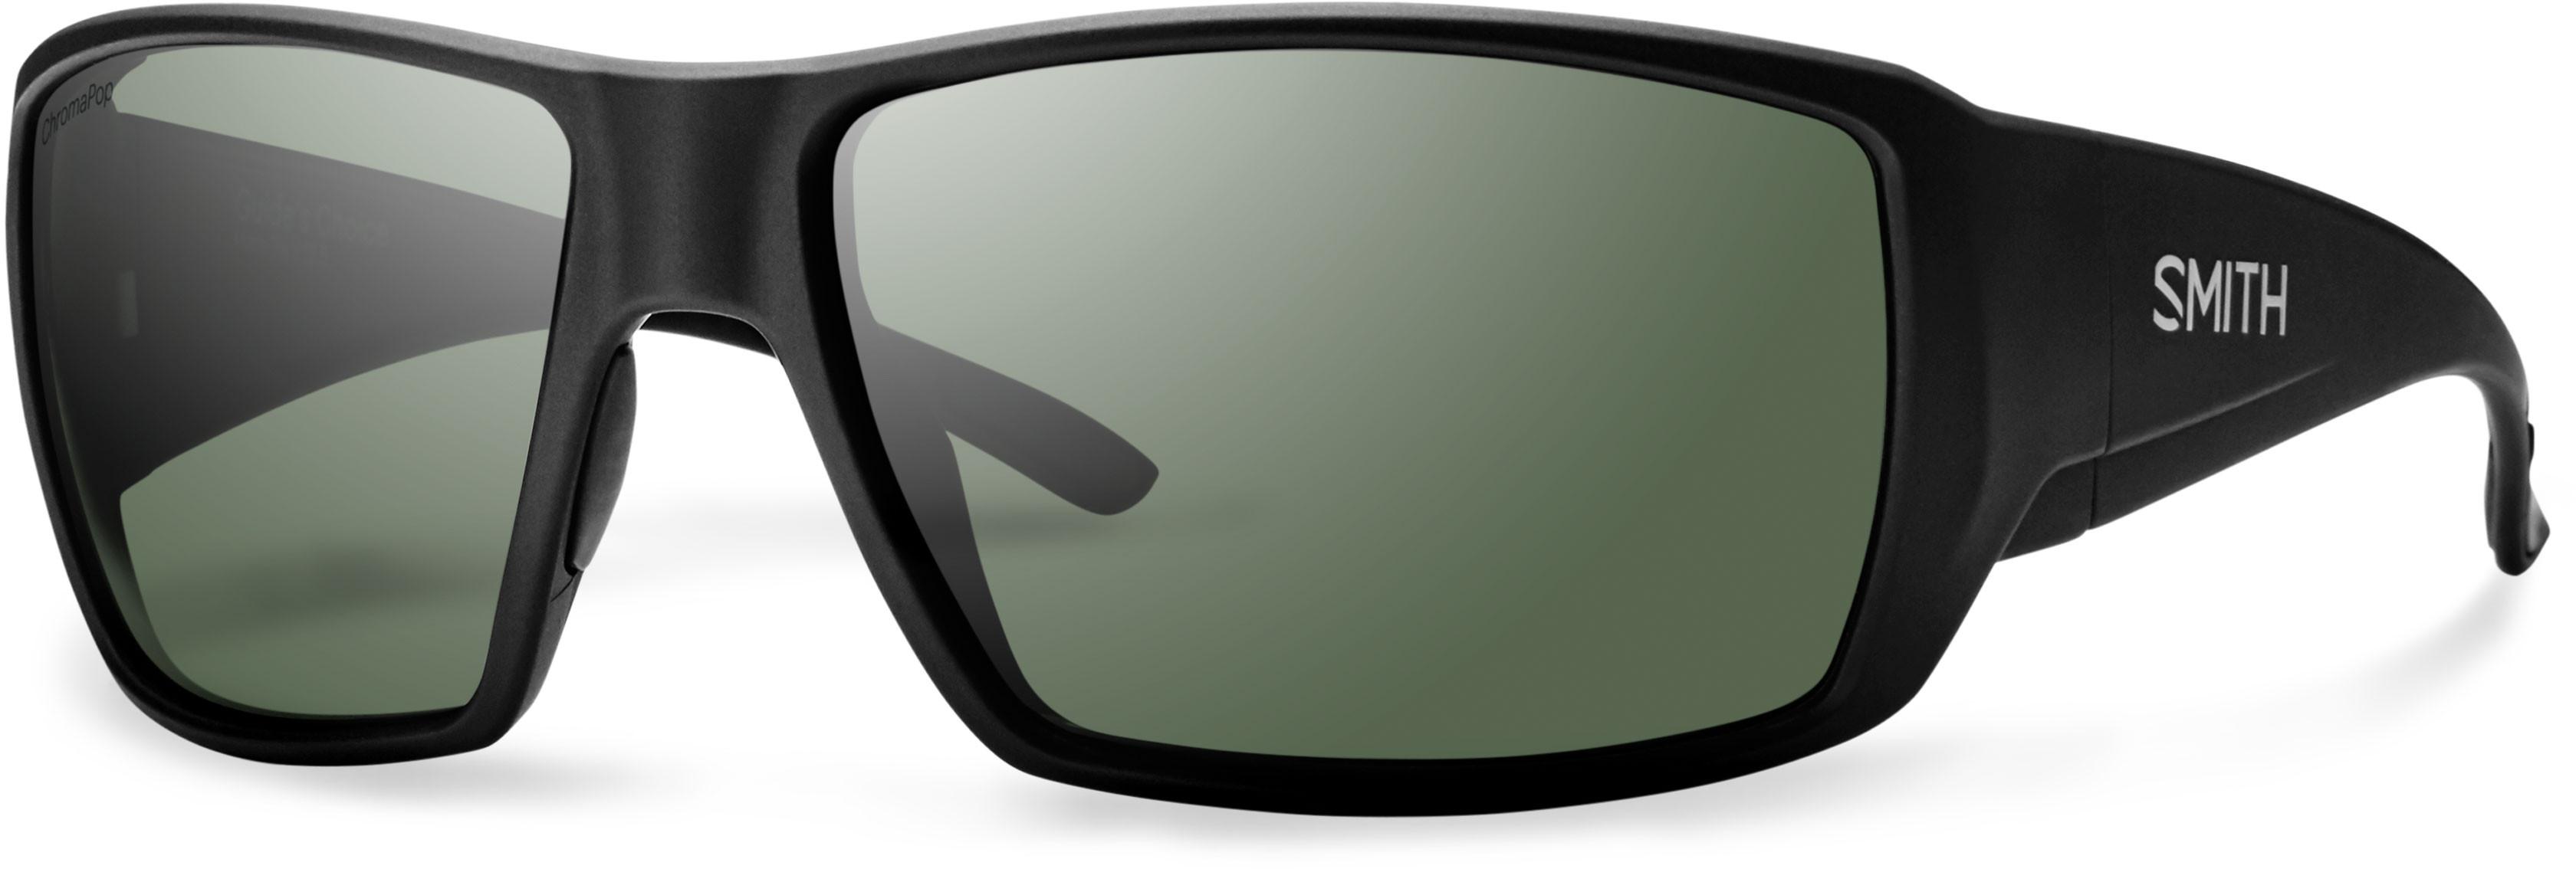 113d4ea43a Smith Guides Choice Eyewear Mens Sunglasses